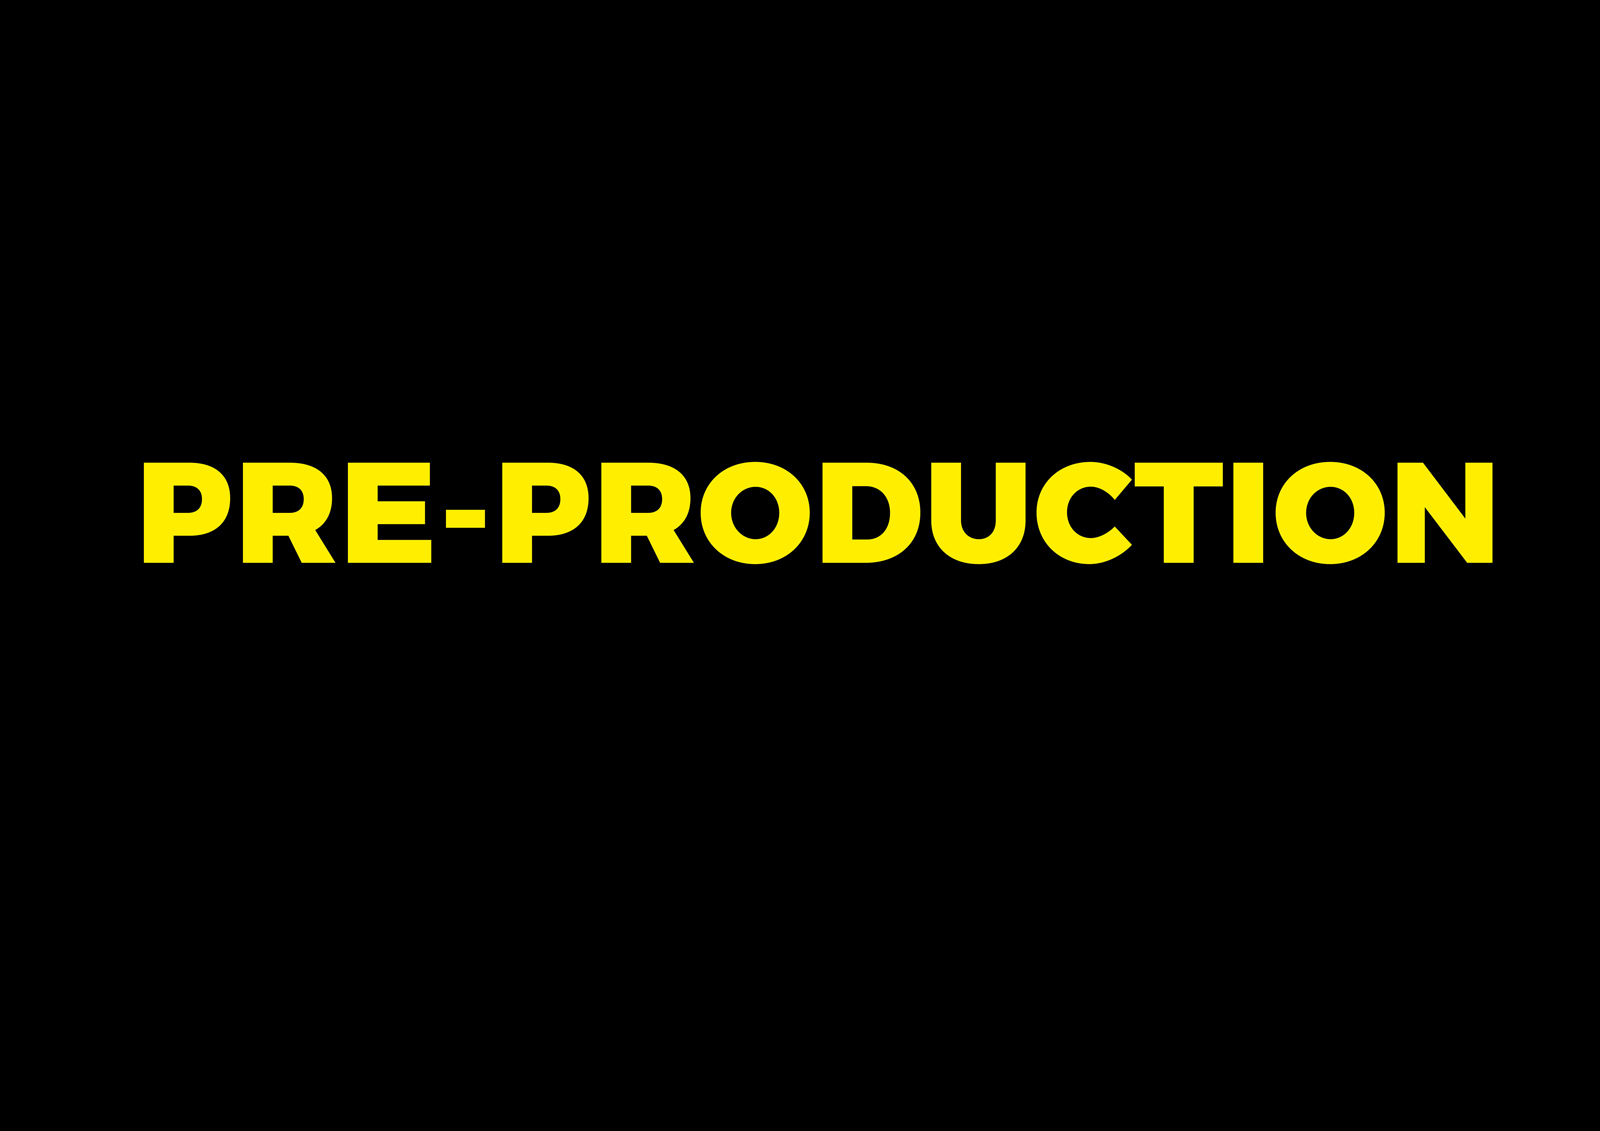 PRE-PRODUCTION-WEB.jpg